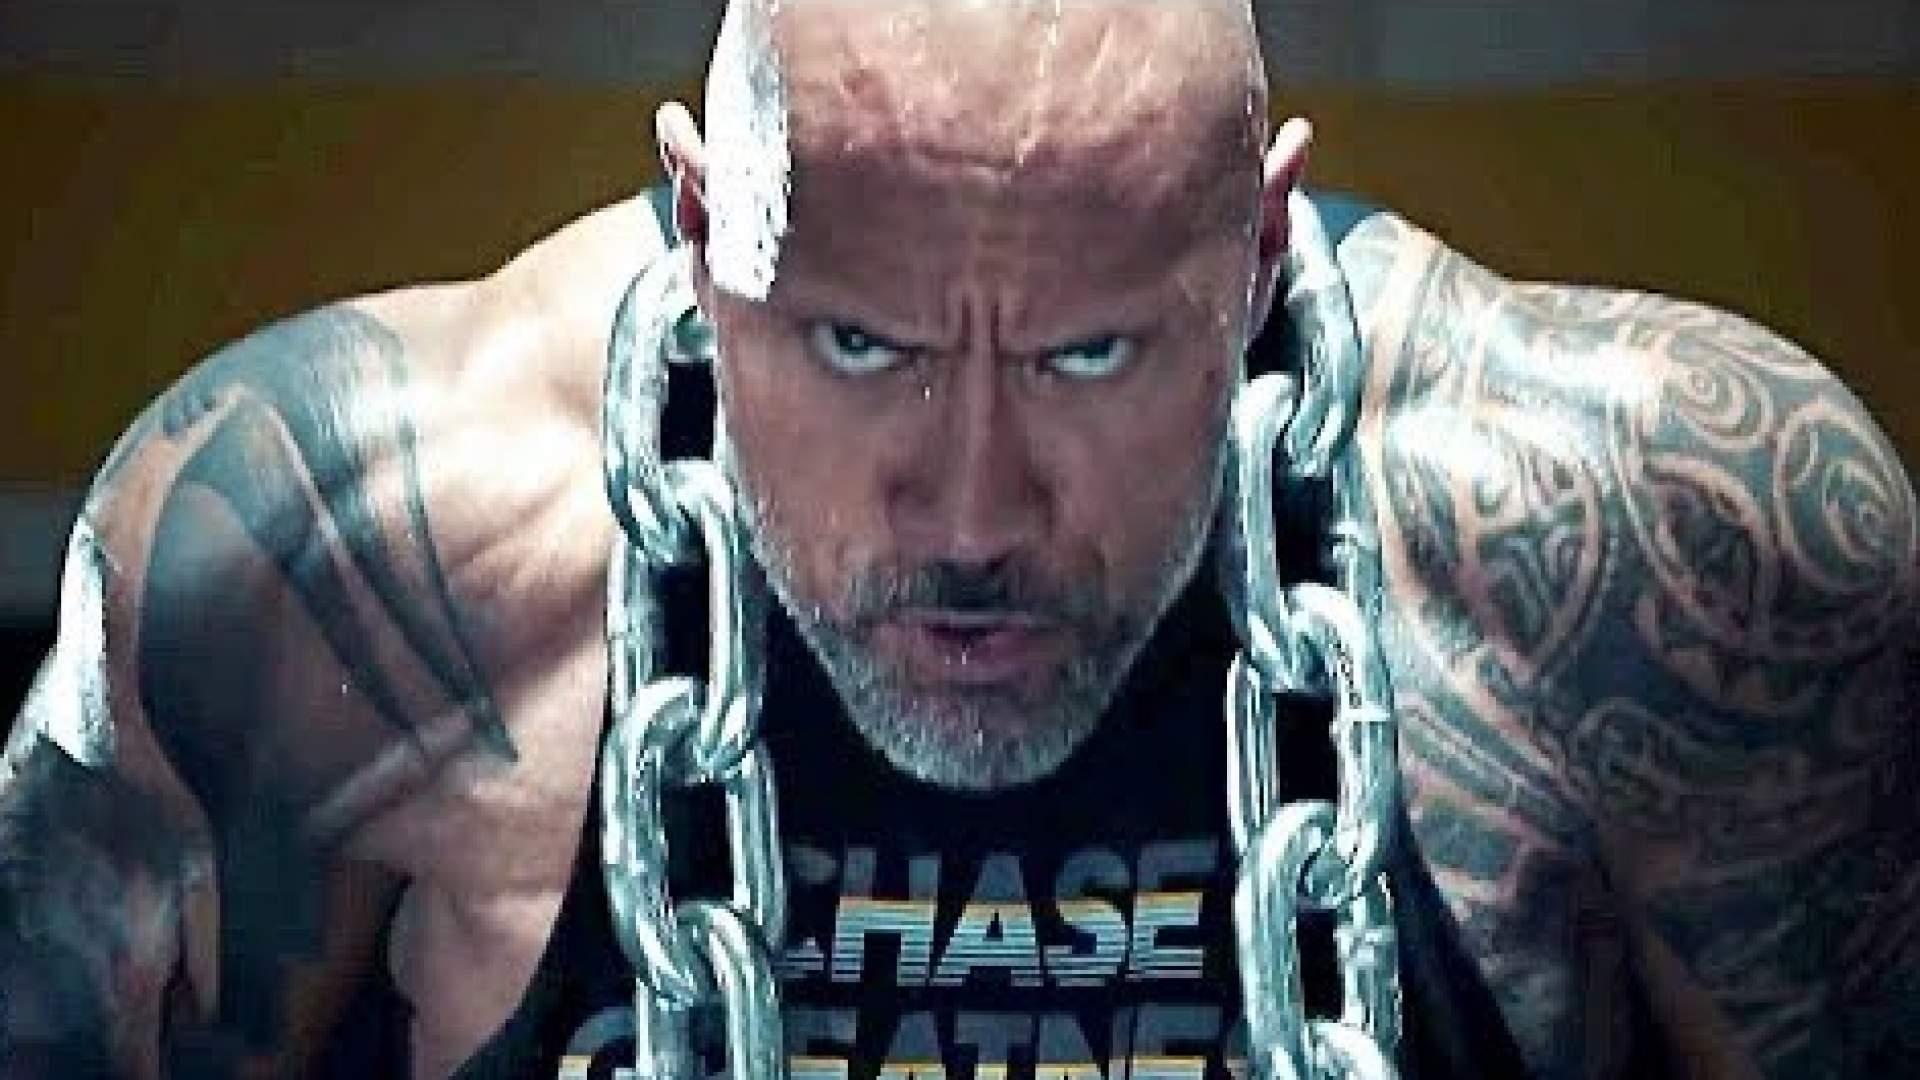 VIDEO: The Rock's Ultimate Workout - So musst du trainieren als 'Sexiest Man Alive'